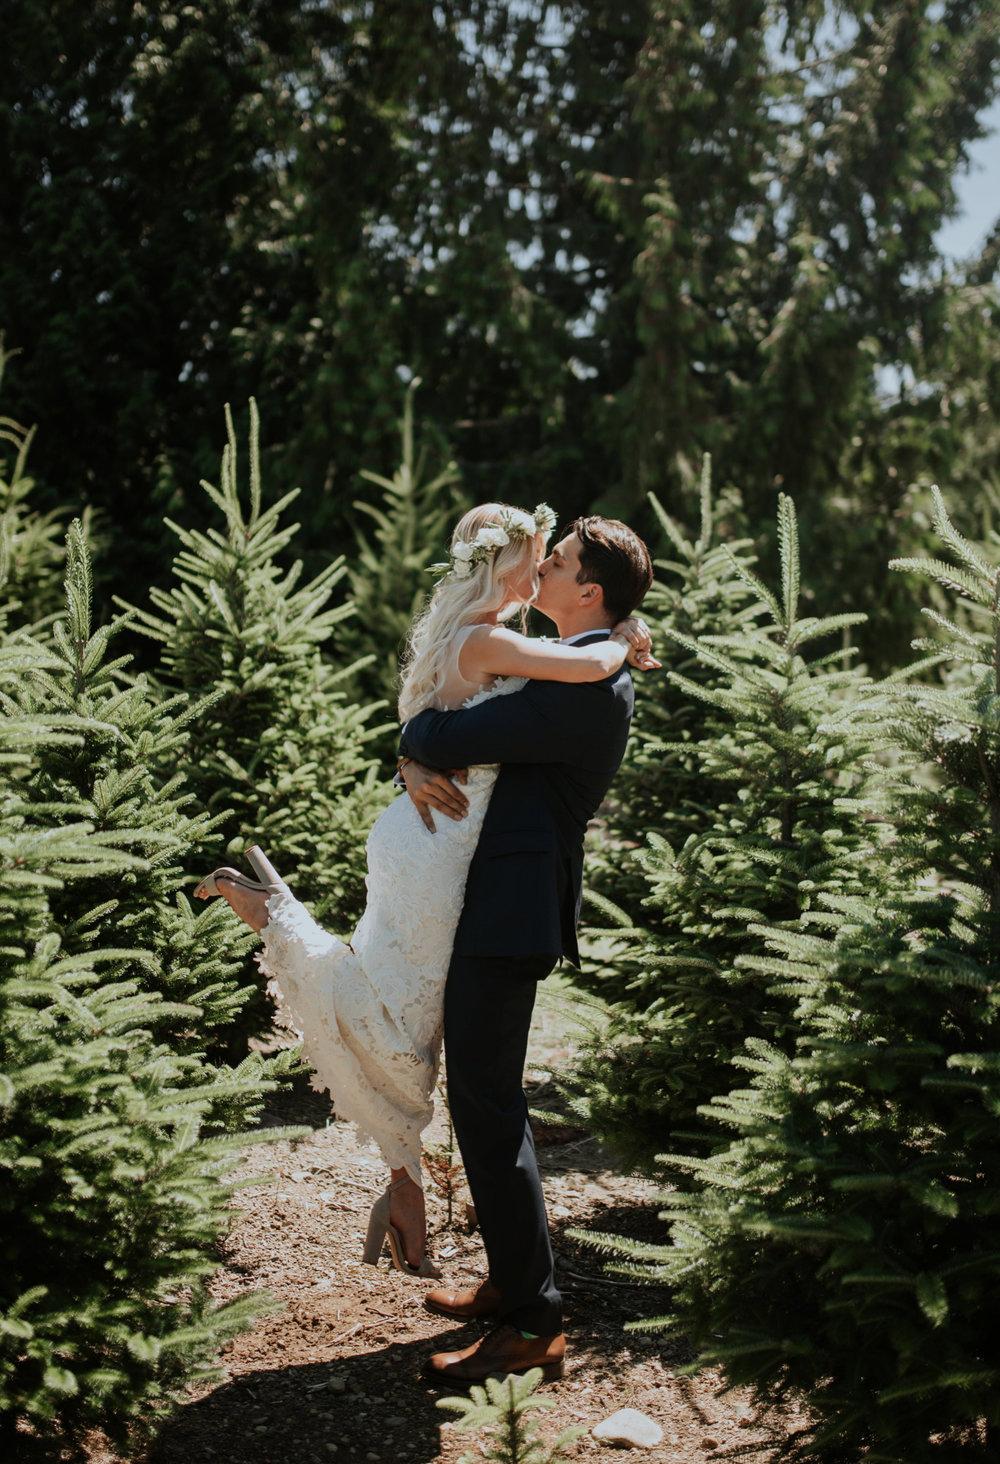 trinity-tree-farm-issaquah-washington-wedding-seattle-lifestyle-photographer-caitlyn-nikula-photography-38.jpg